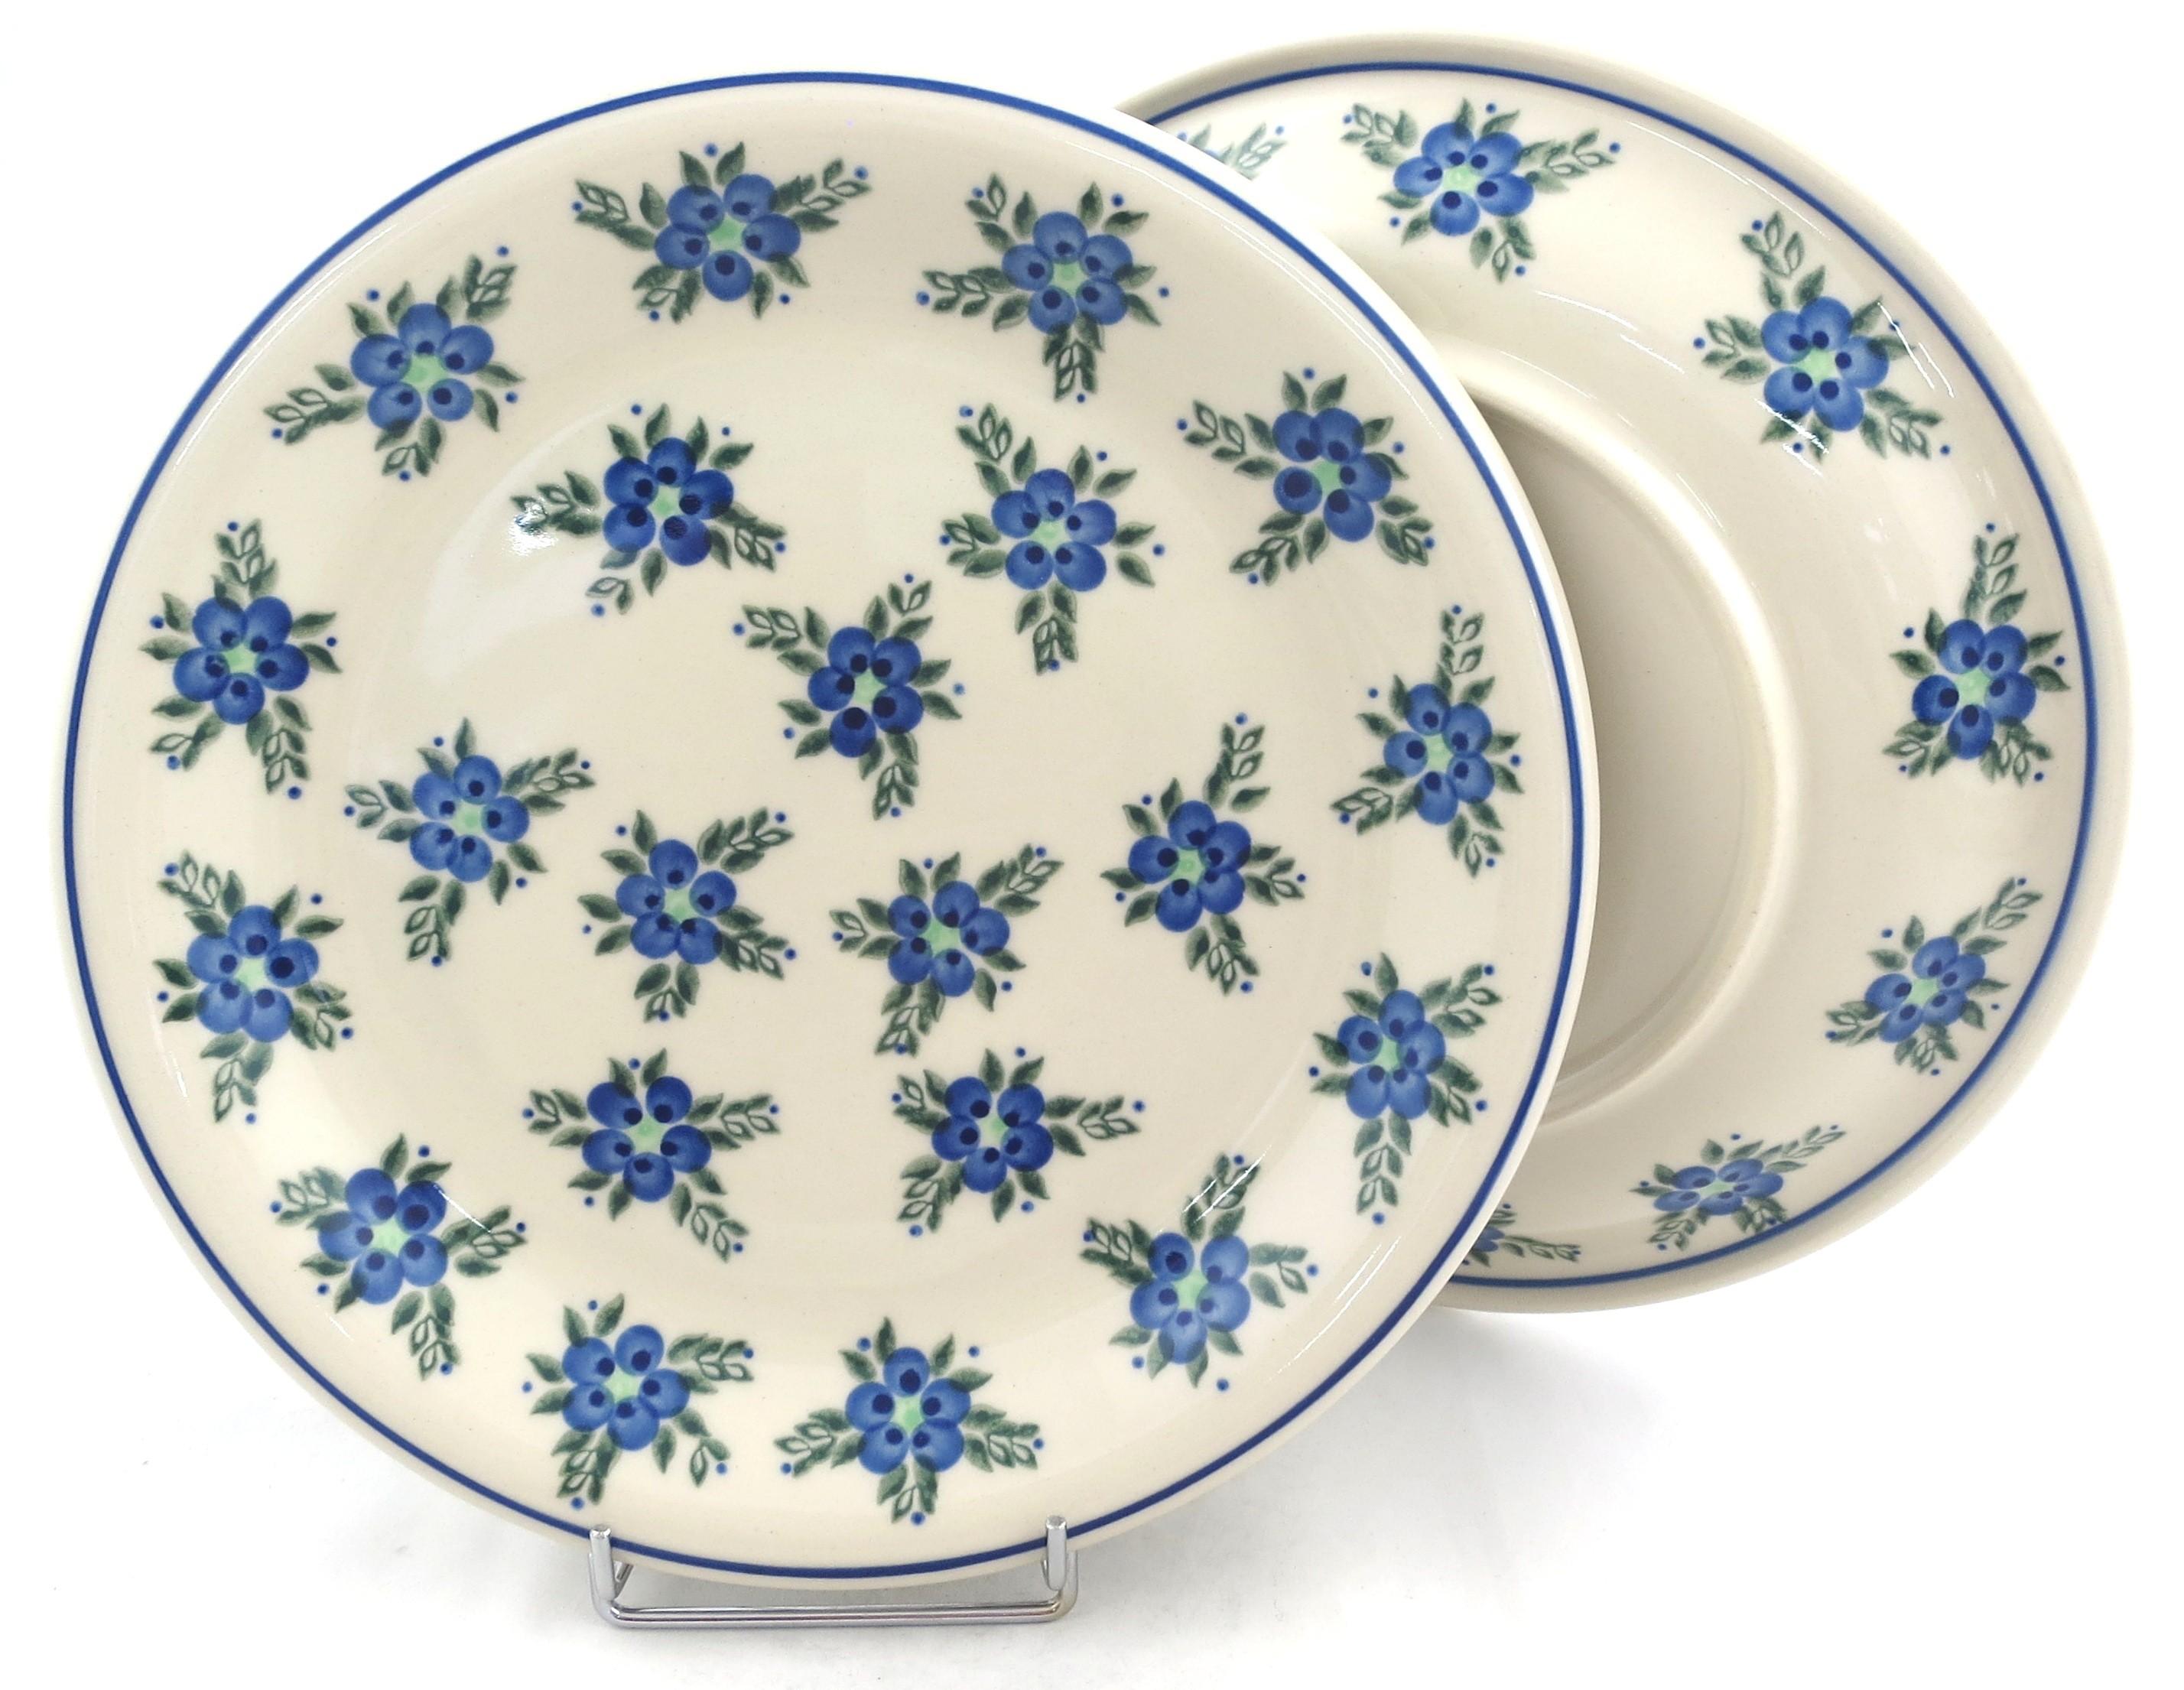 "Pottery Avenue 10.25"" Dinner Plate   VENA-UNIKAT"